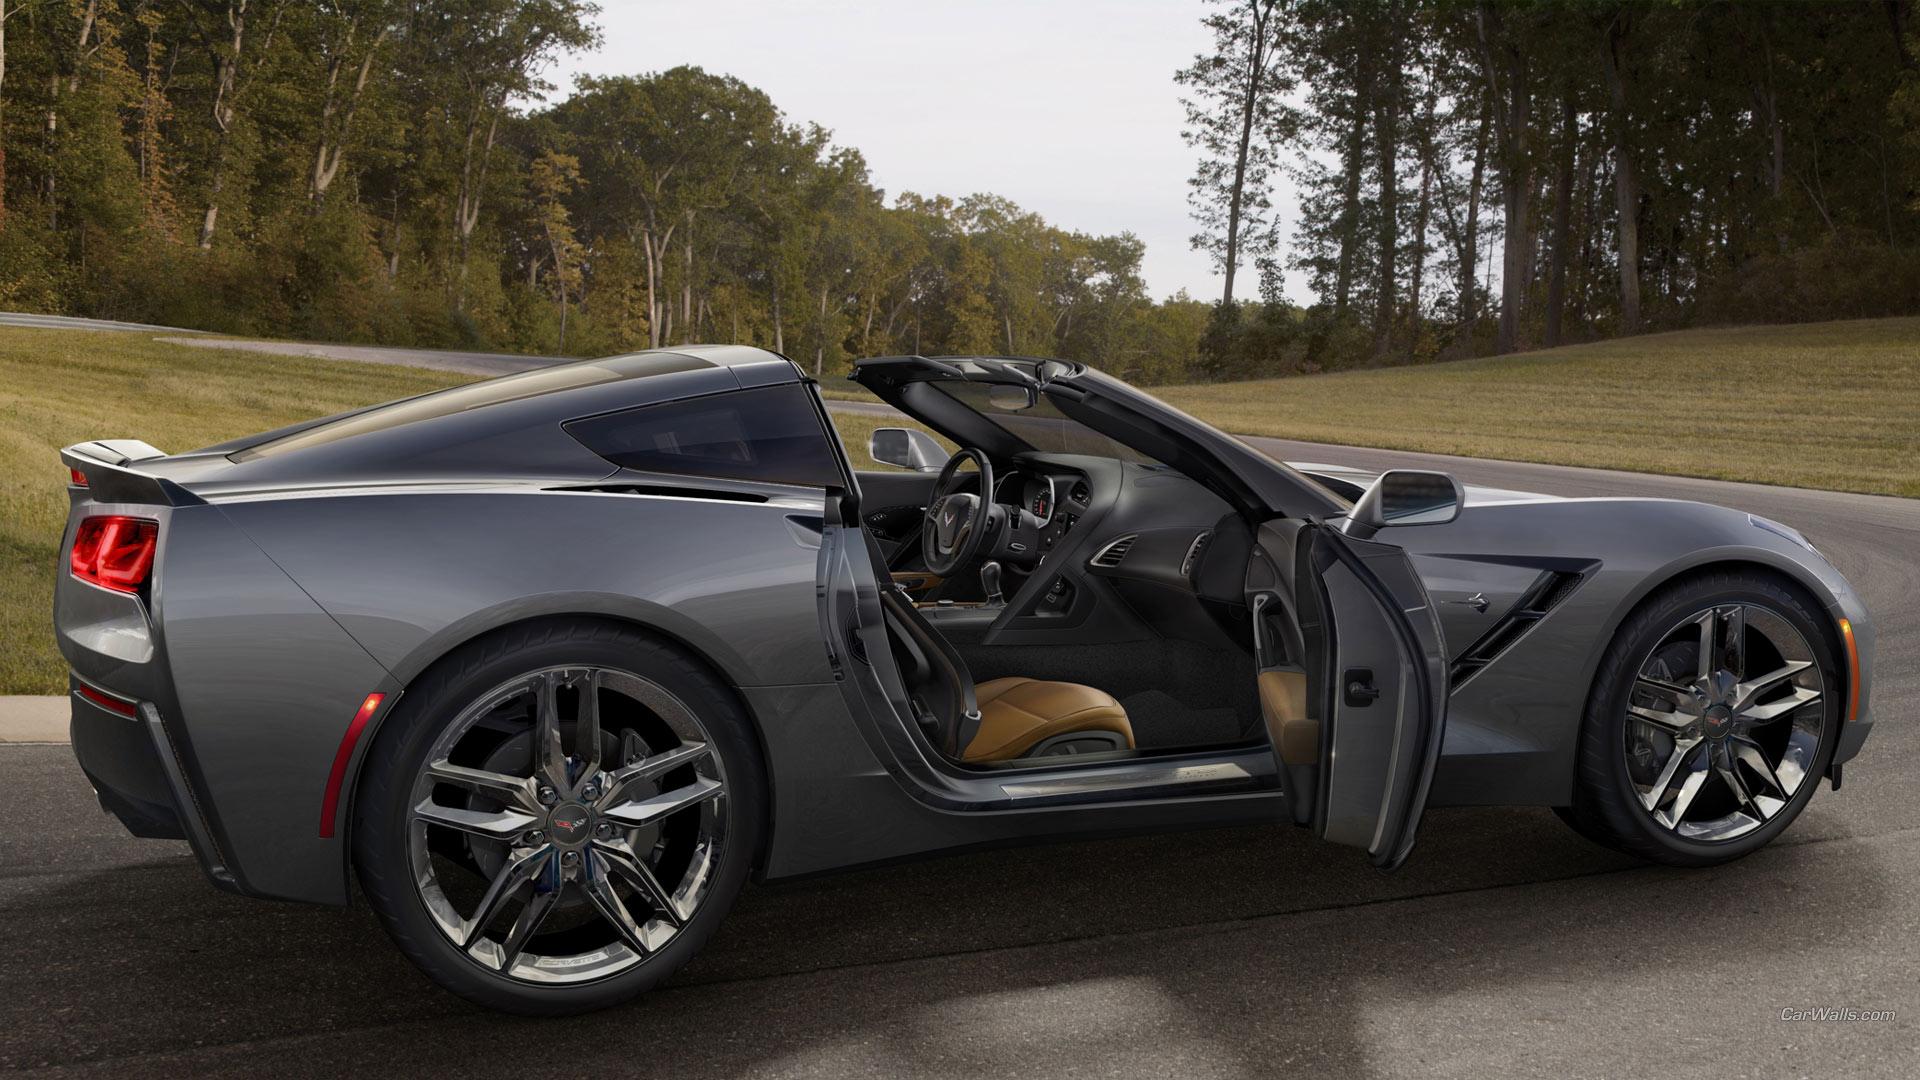 HD Corvette C7 Wallpapers 2014 1920x1080